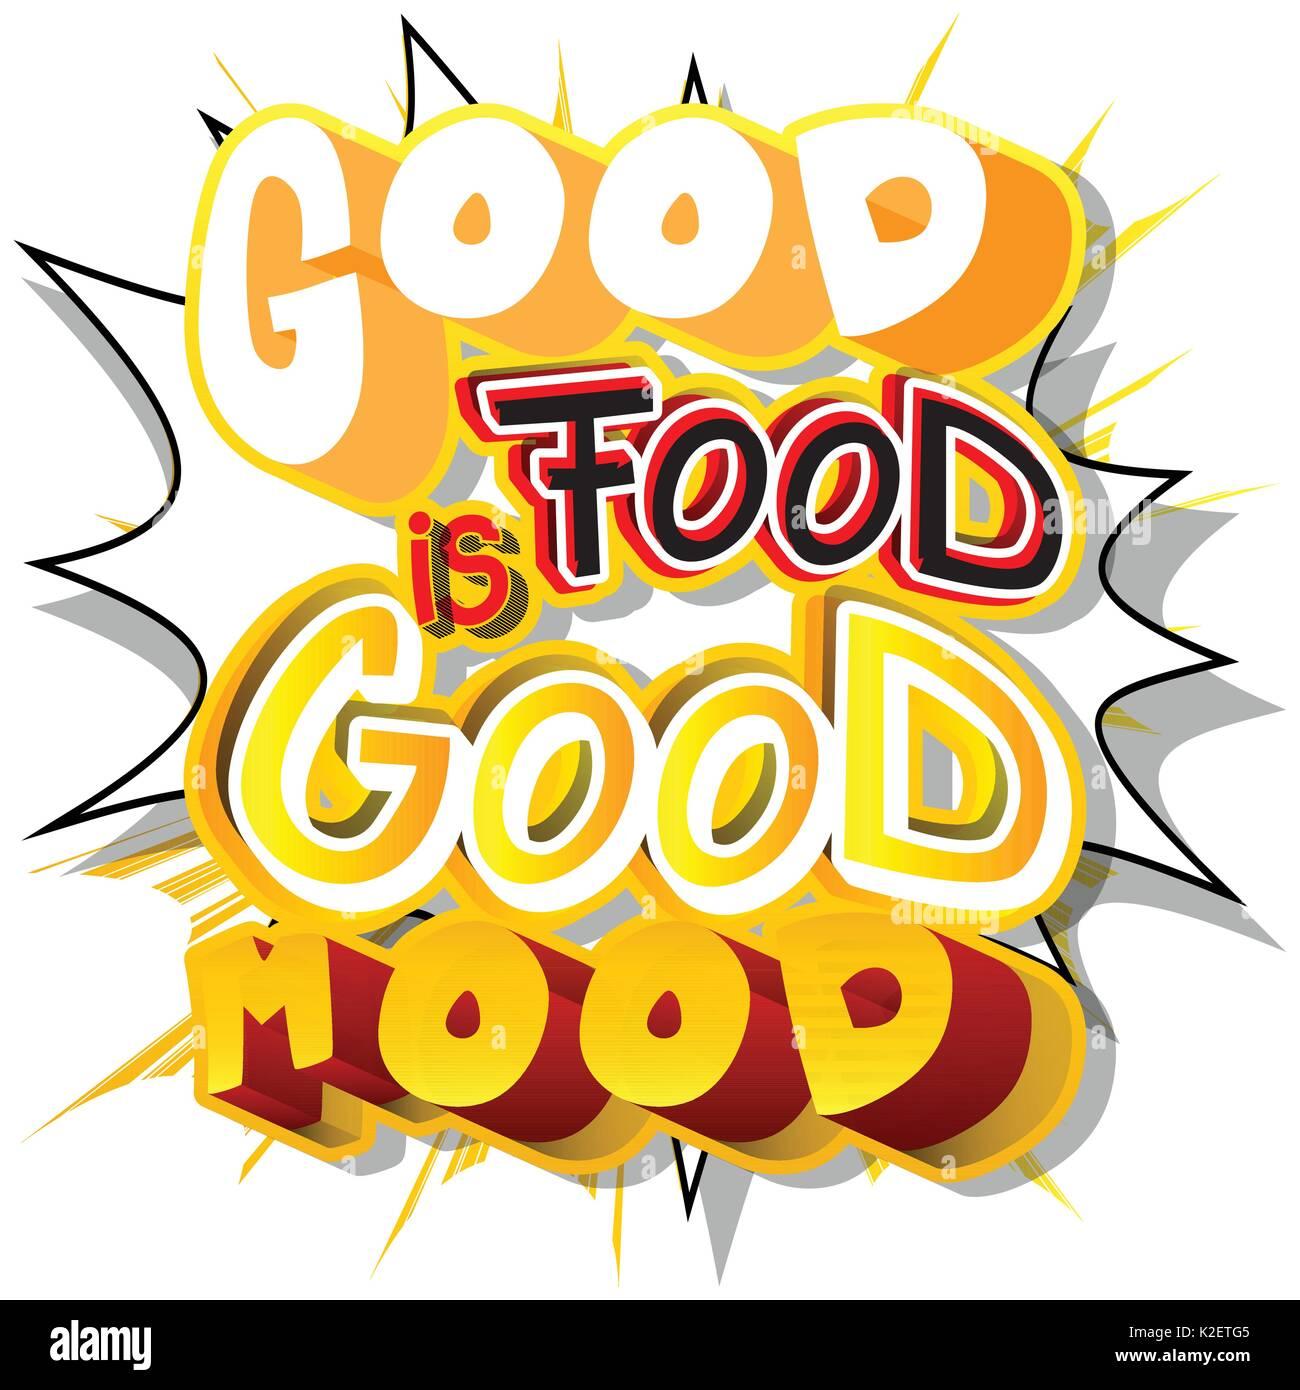 Gutes Essen Ist Gute Laune Vektor Illustrierte Comic Design